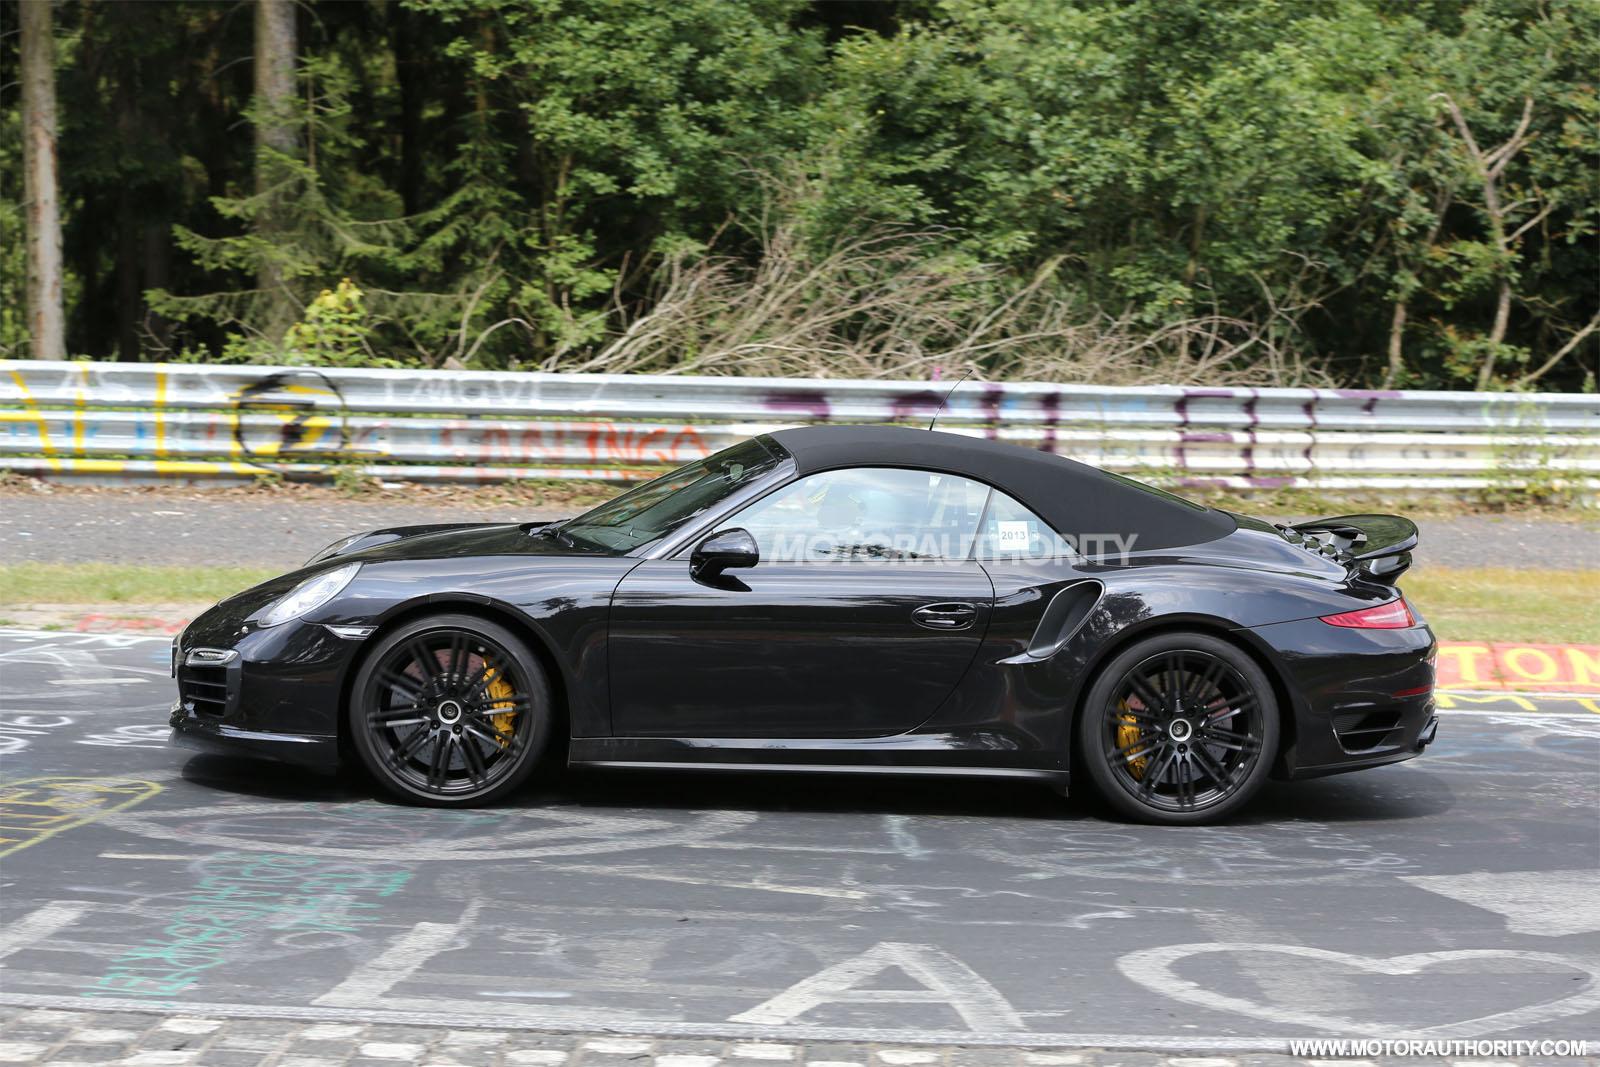 2014 porsche 911 turbo s cabriolet spy shots